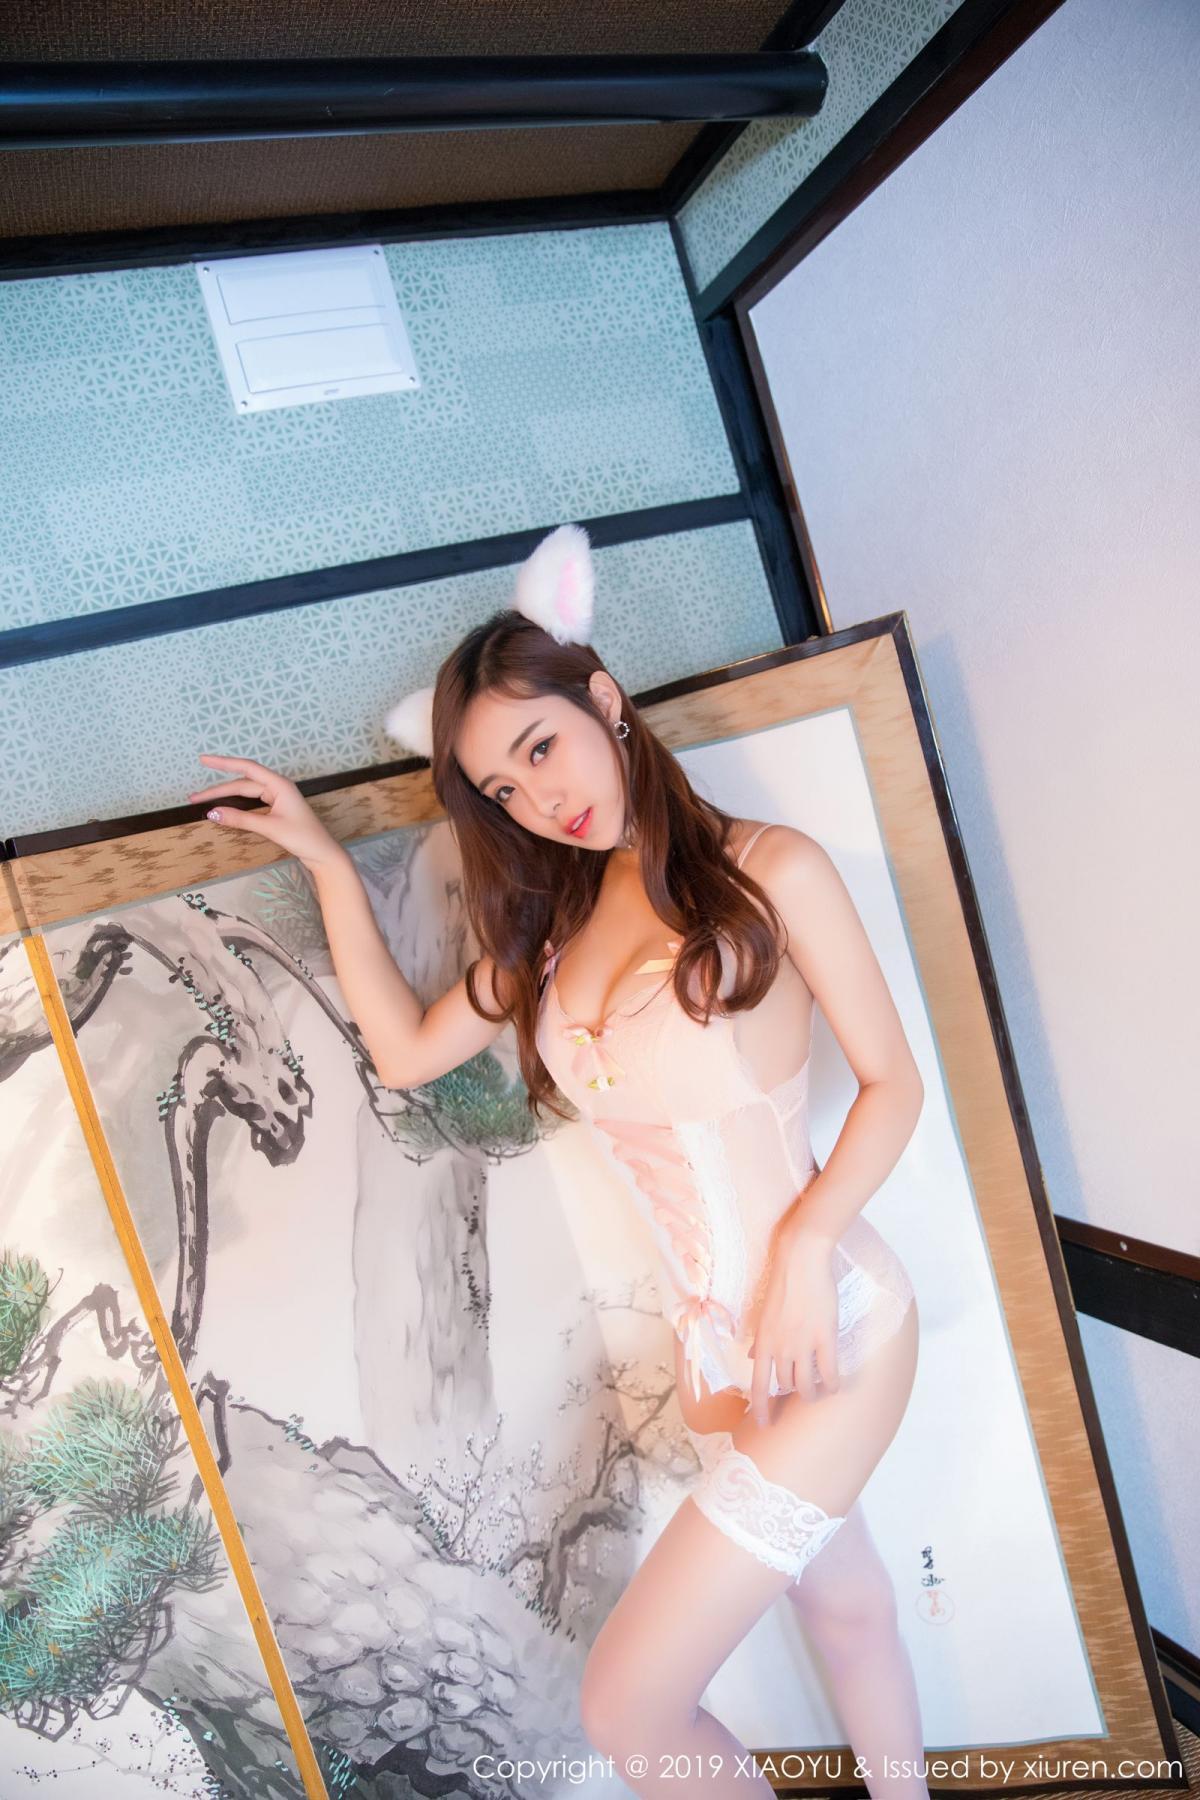 [XiaoYu] Vol.001 Hu Ya Mao Bao 10P, Hu Ya Mao Bao, Tall, Underwear, XiaoYu